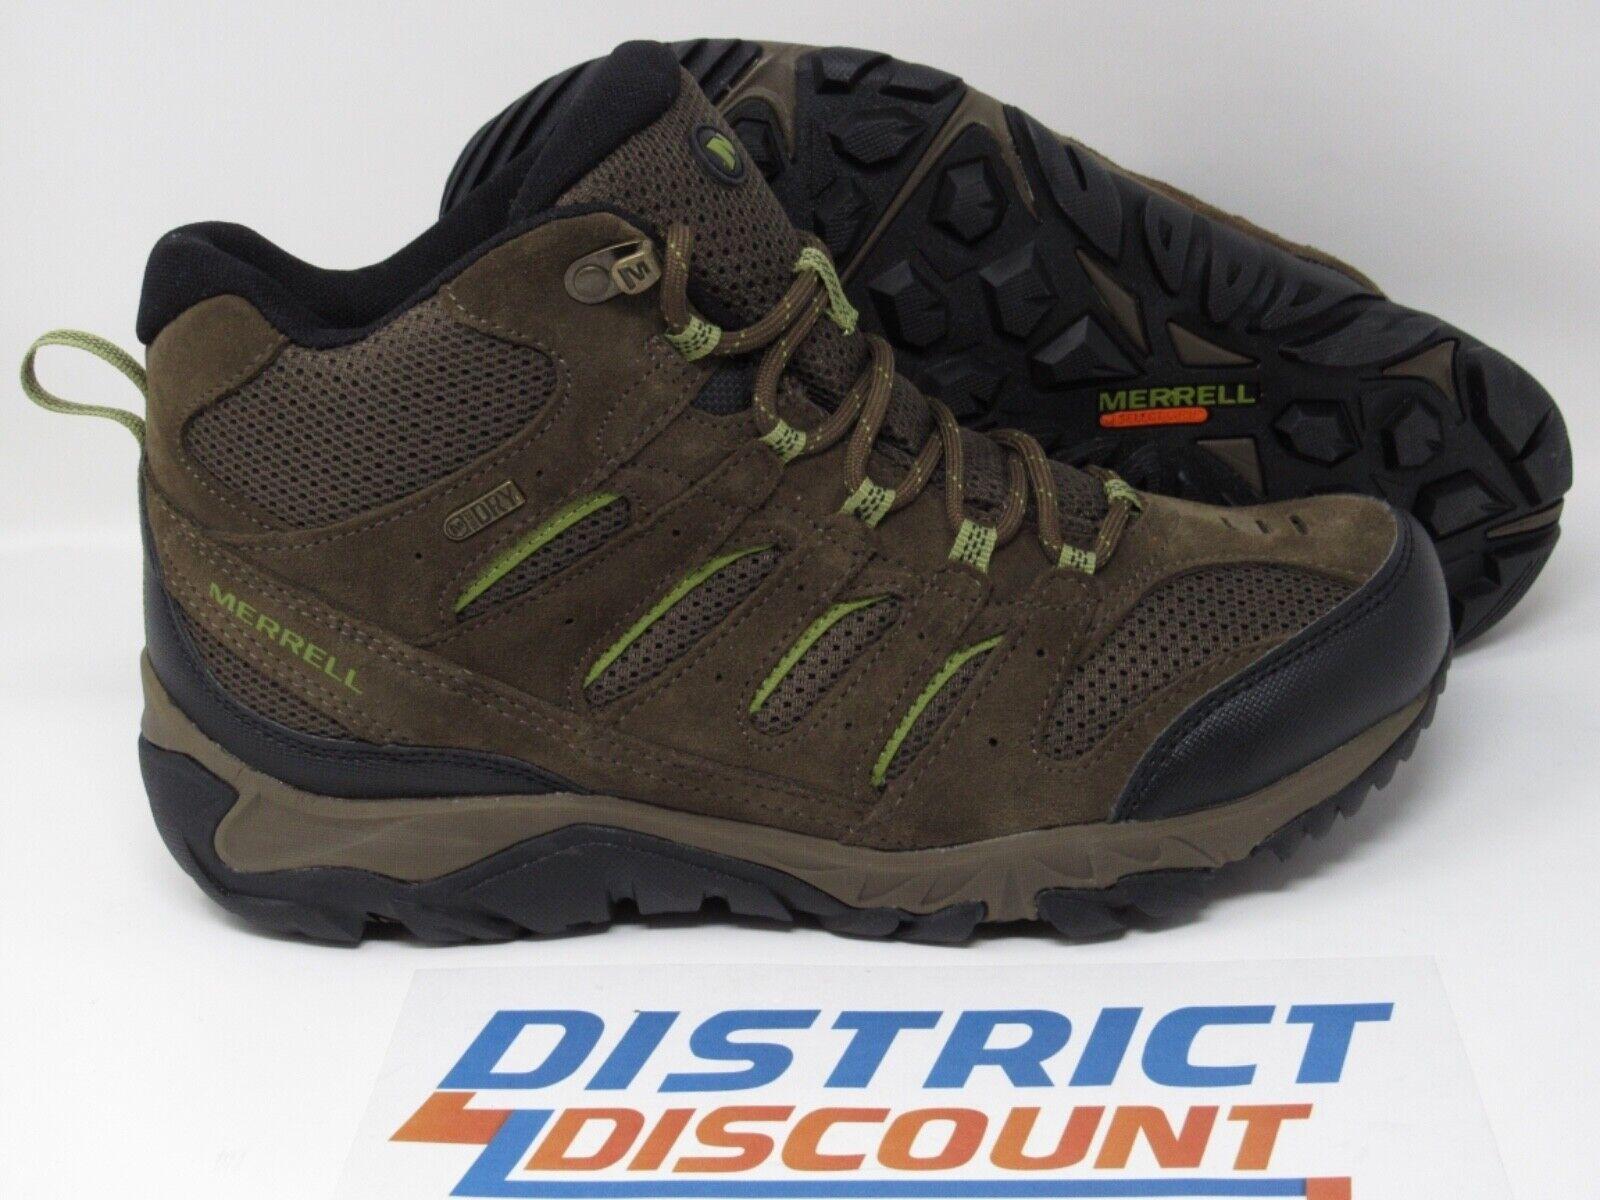 MERRELL White Pine Mid Ventilator Hiking Boots Canteen (J09561) Men's sz 10.5